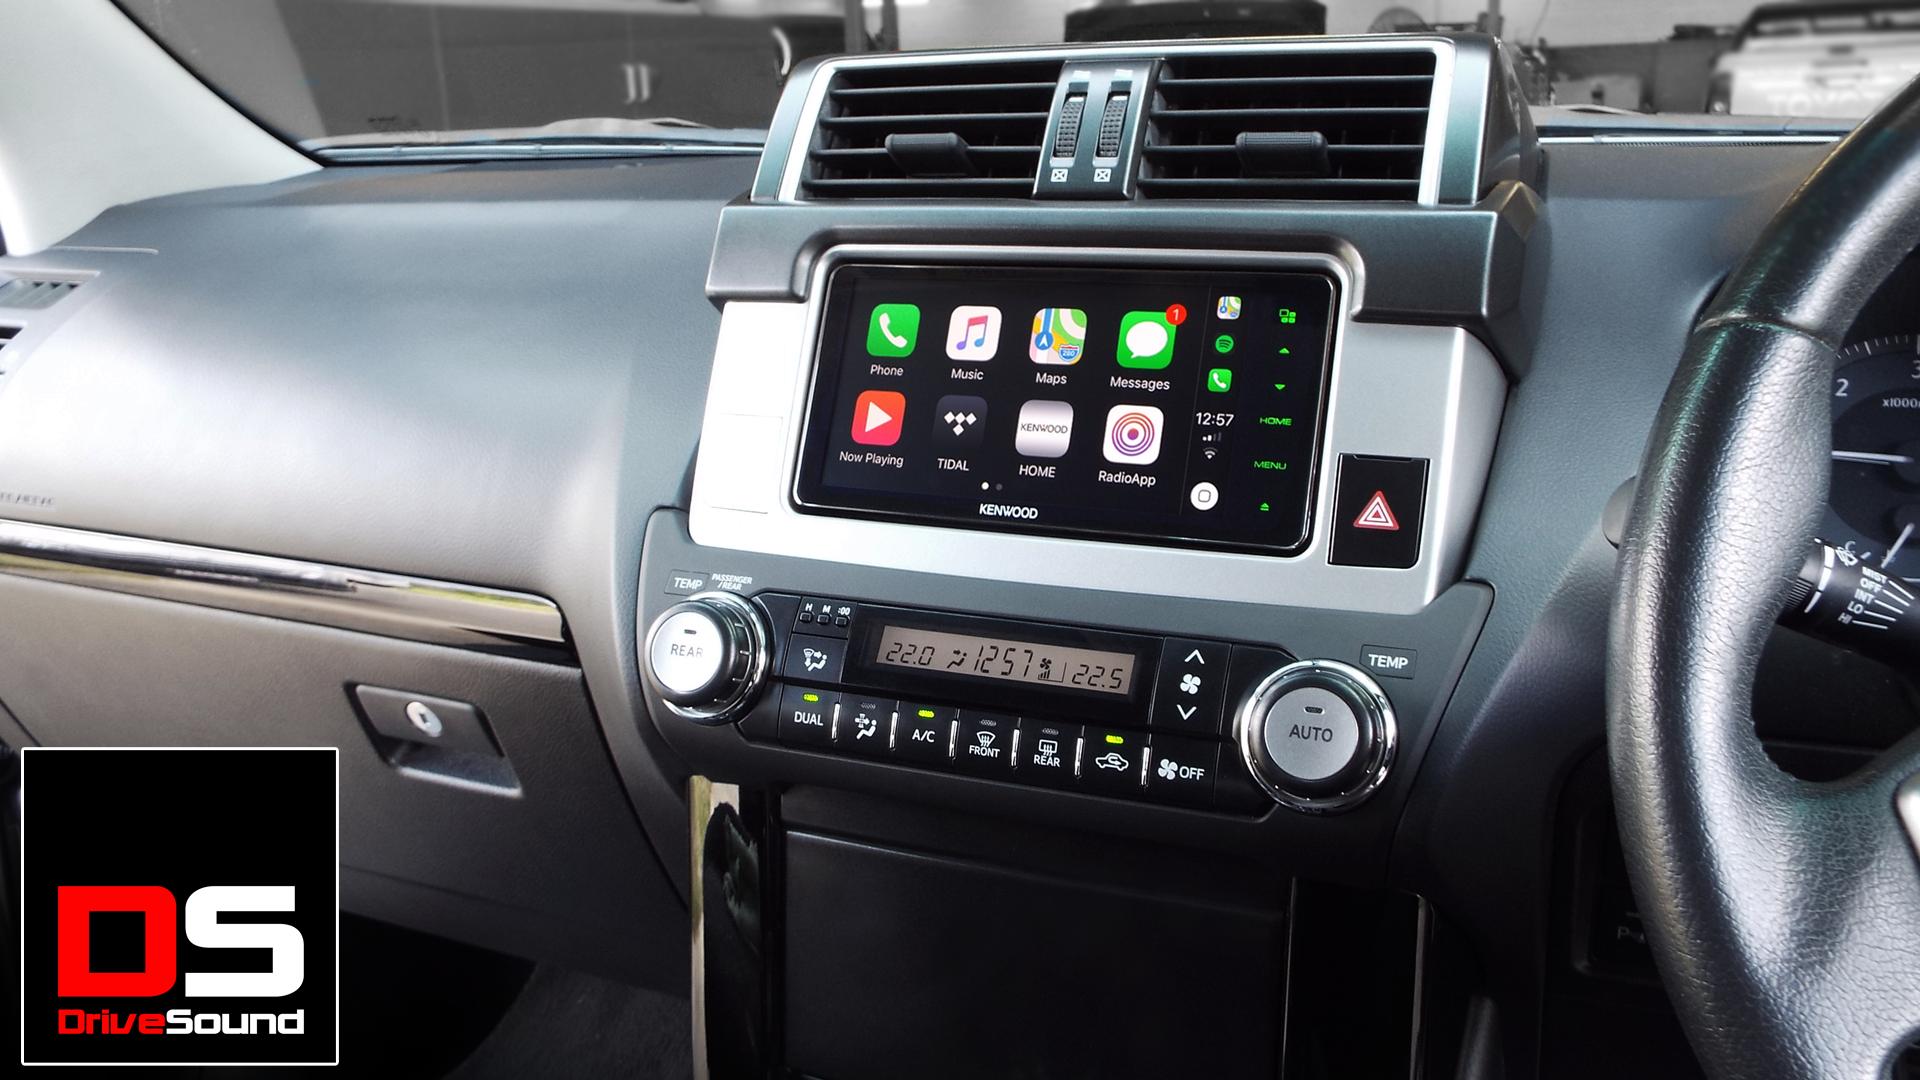 200 Series Toyota Land Cruiser with Apple CarPlay